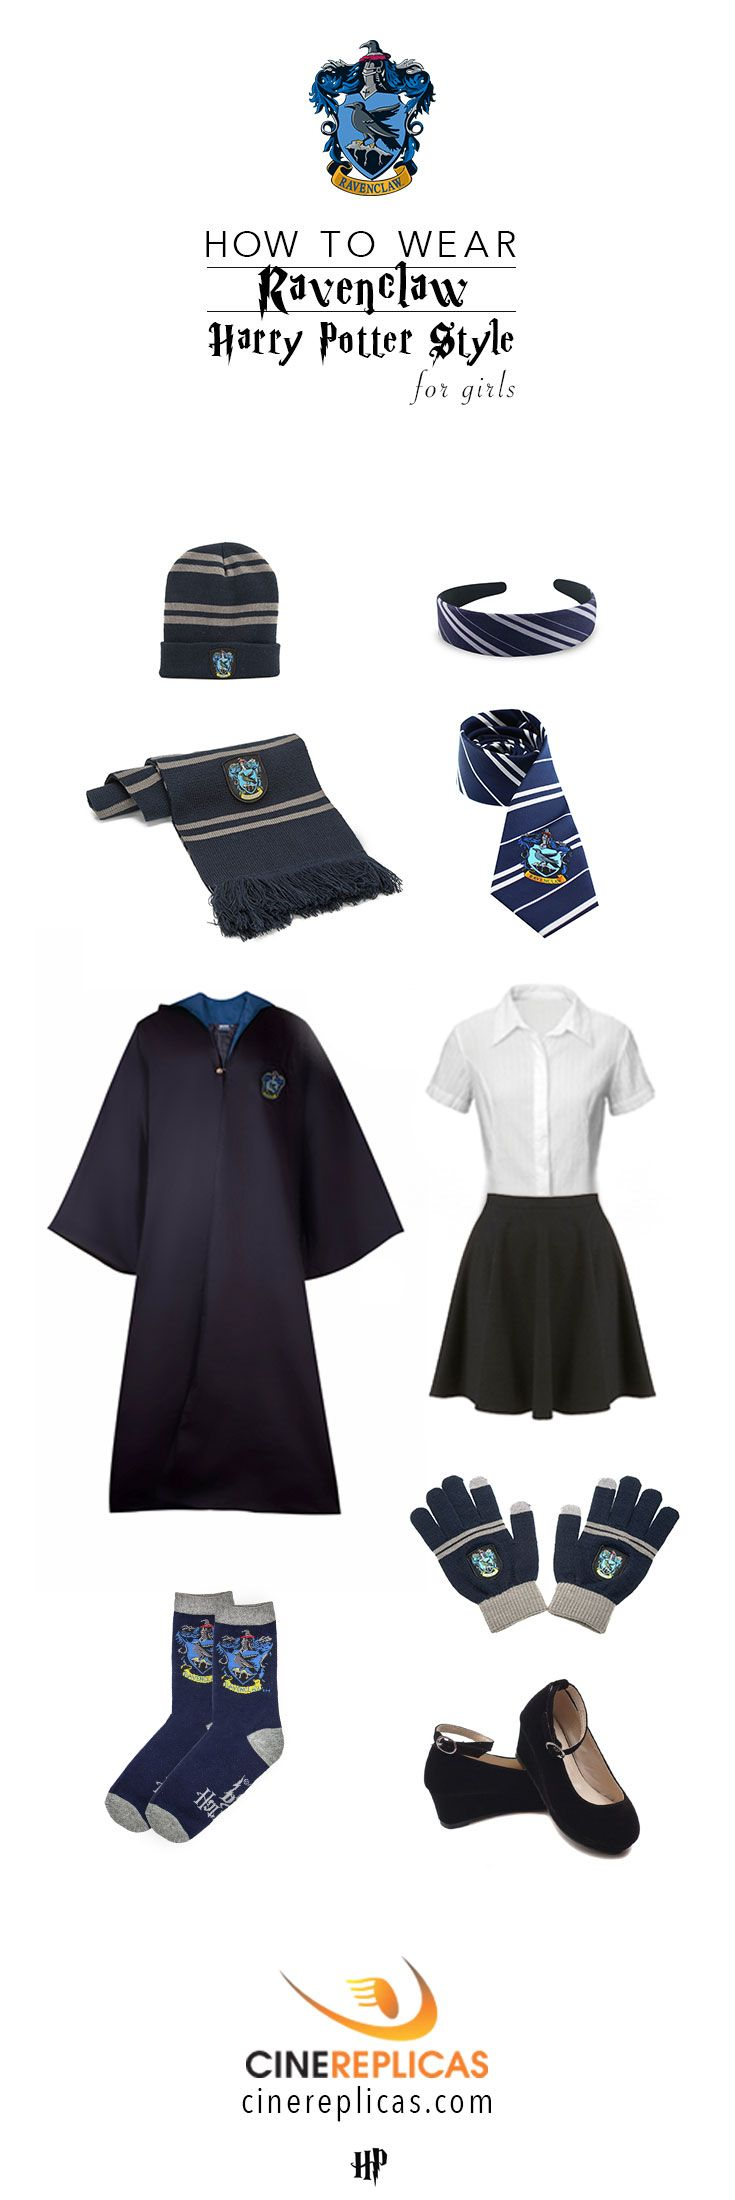 Ravenclaw Harry Potter Style for Girls #HarryPotter #Ravenclaw www.cinereplicas.com